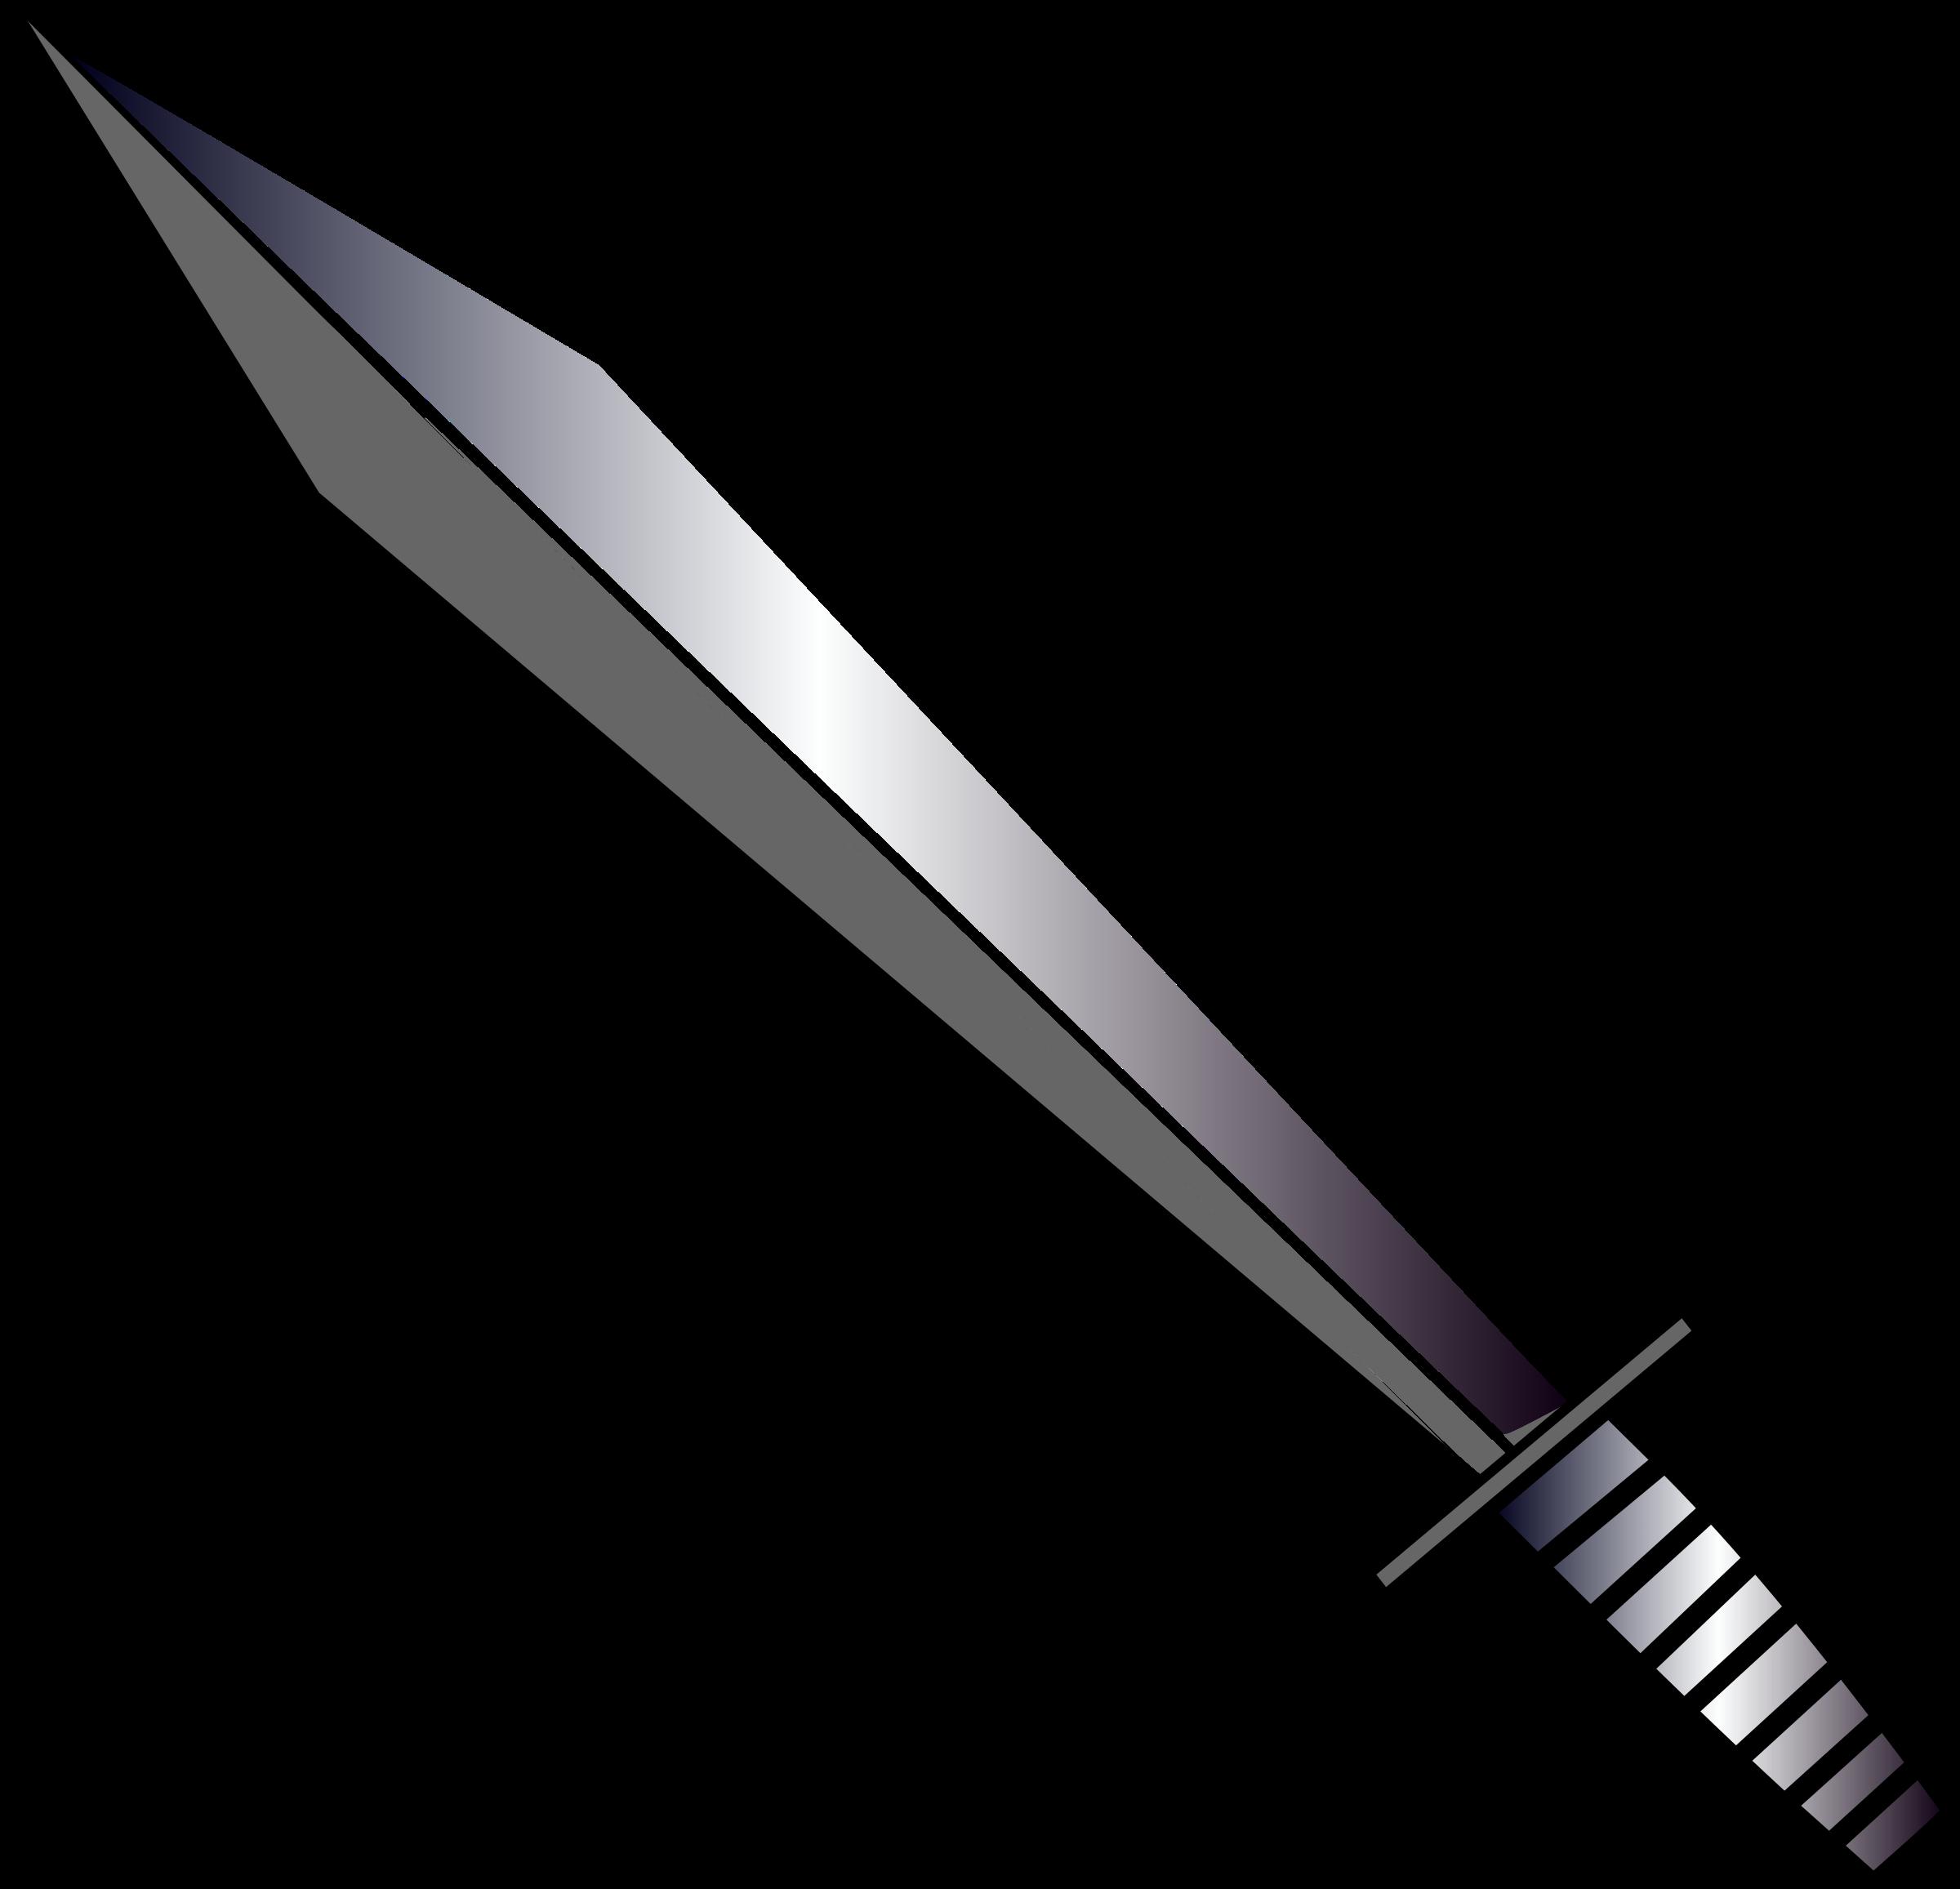 Dagger clipart renaissance. Sword big image png